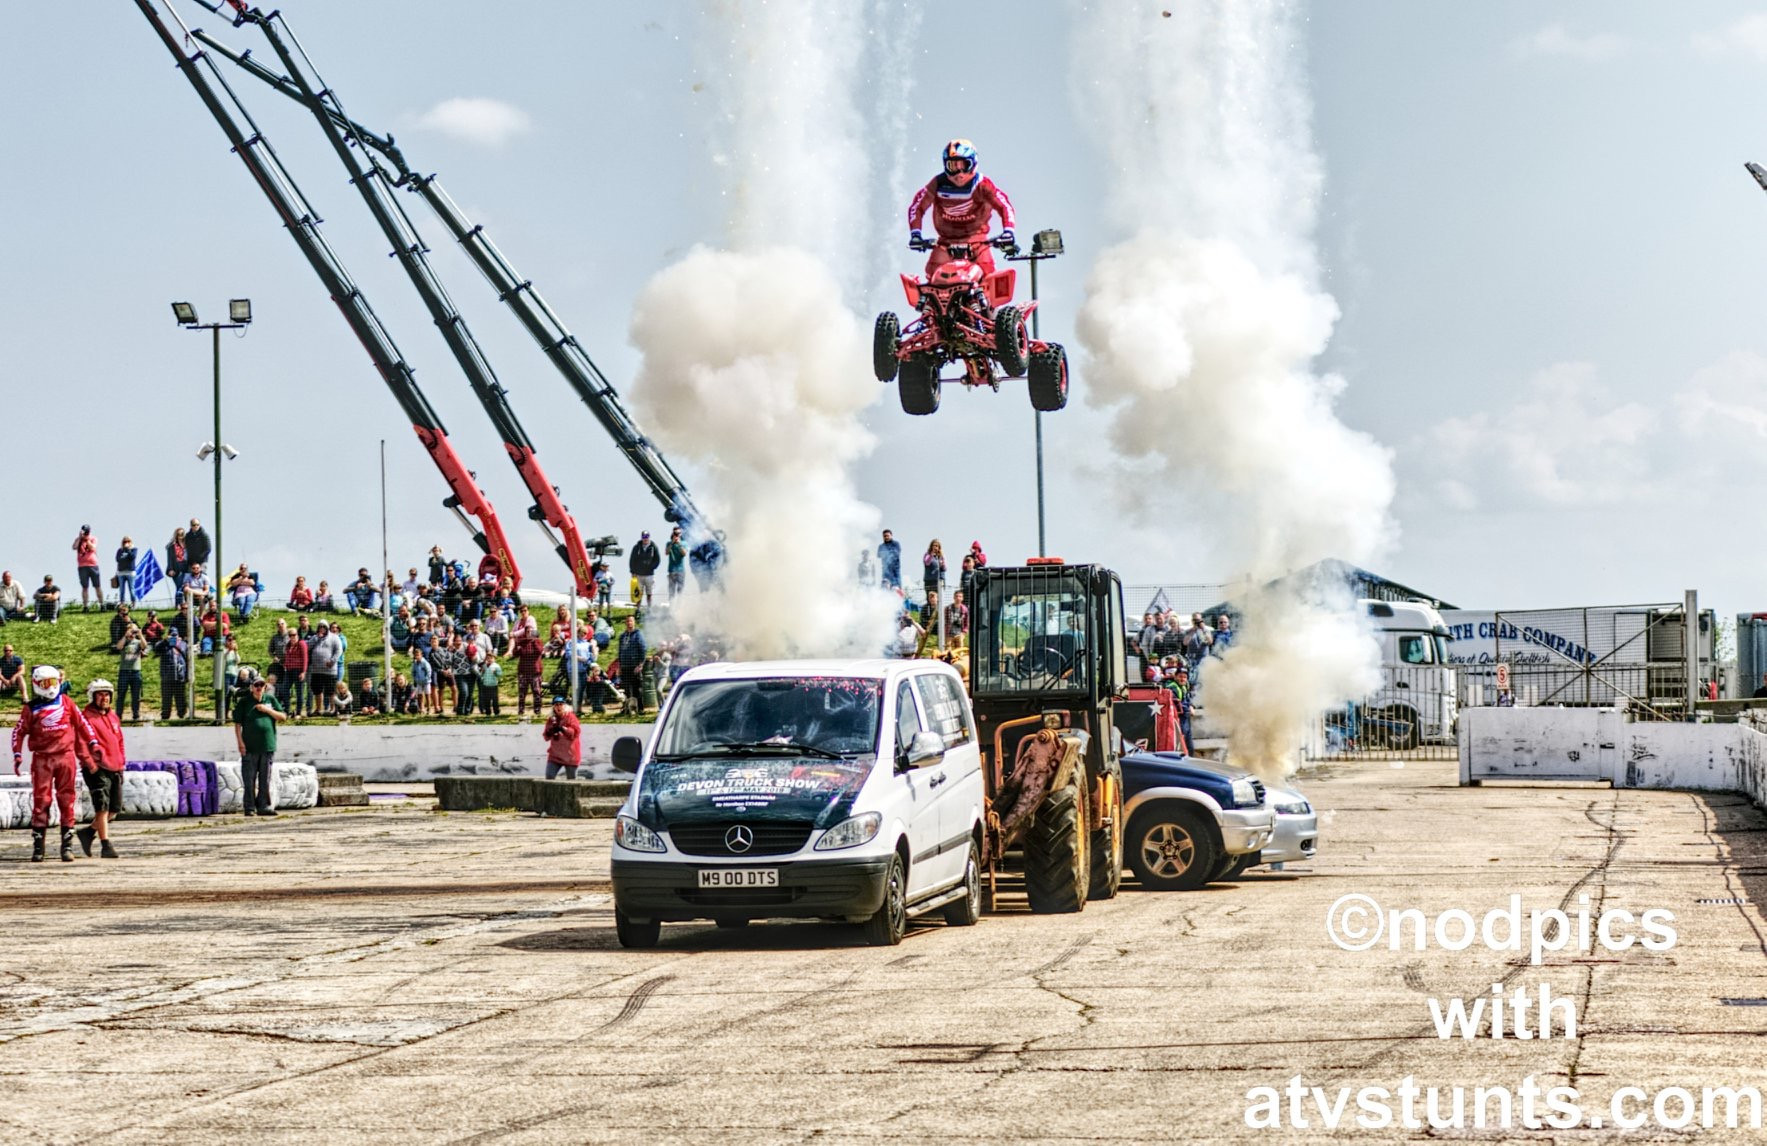 ATV Stunt Show